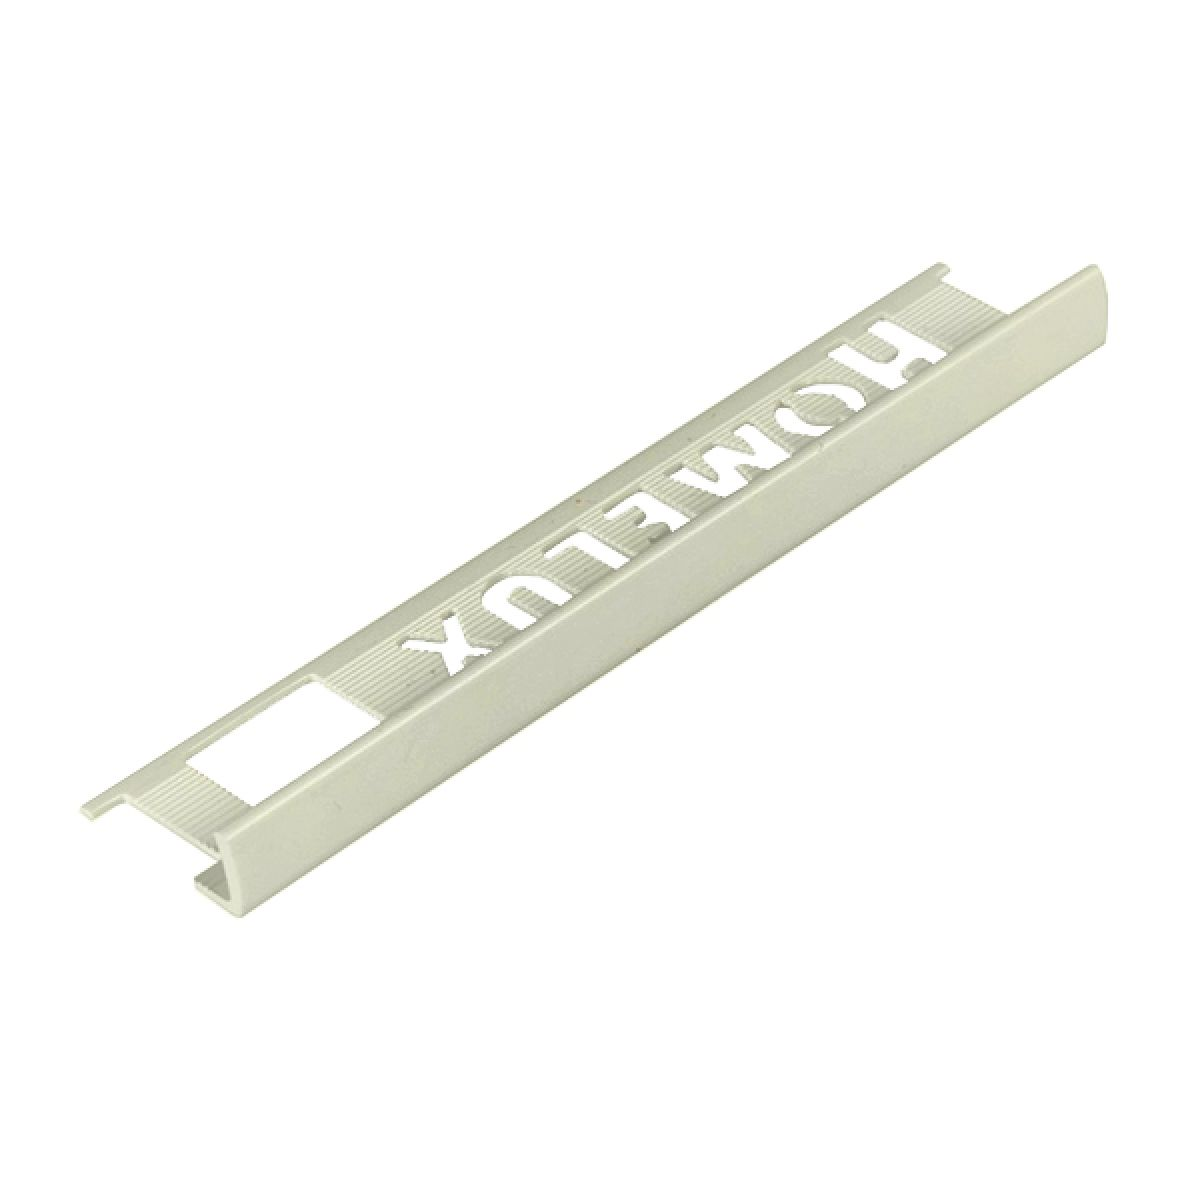 Homelux PVC Straight Edge 6mm Soft Cream Tile Trim 2.5m